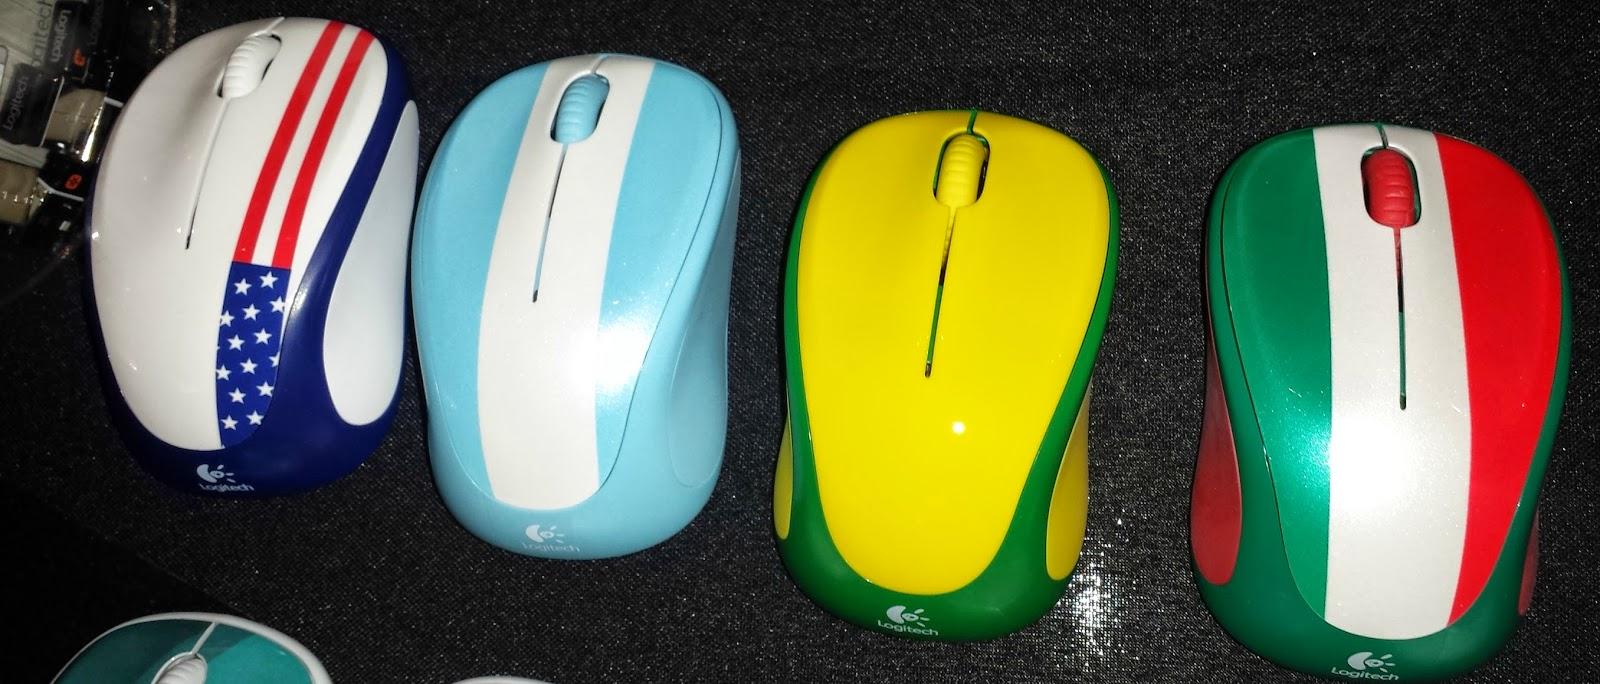 Logitech Mice - www.mylifeonandofftheguestlist.com